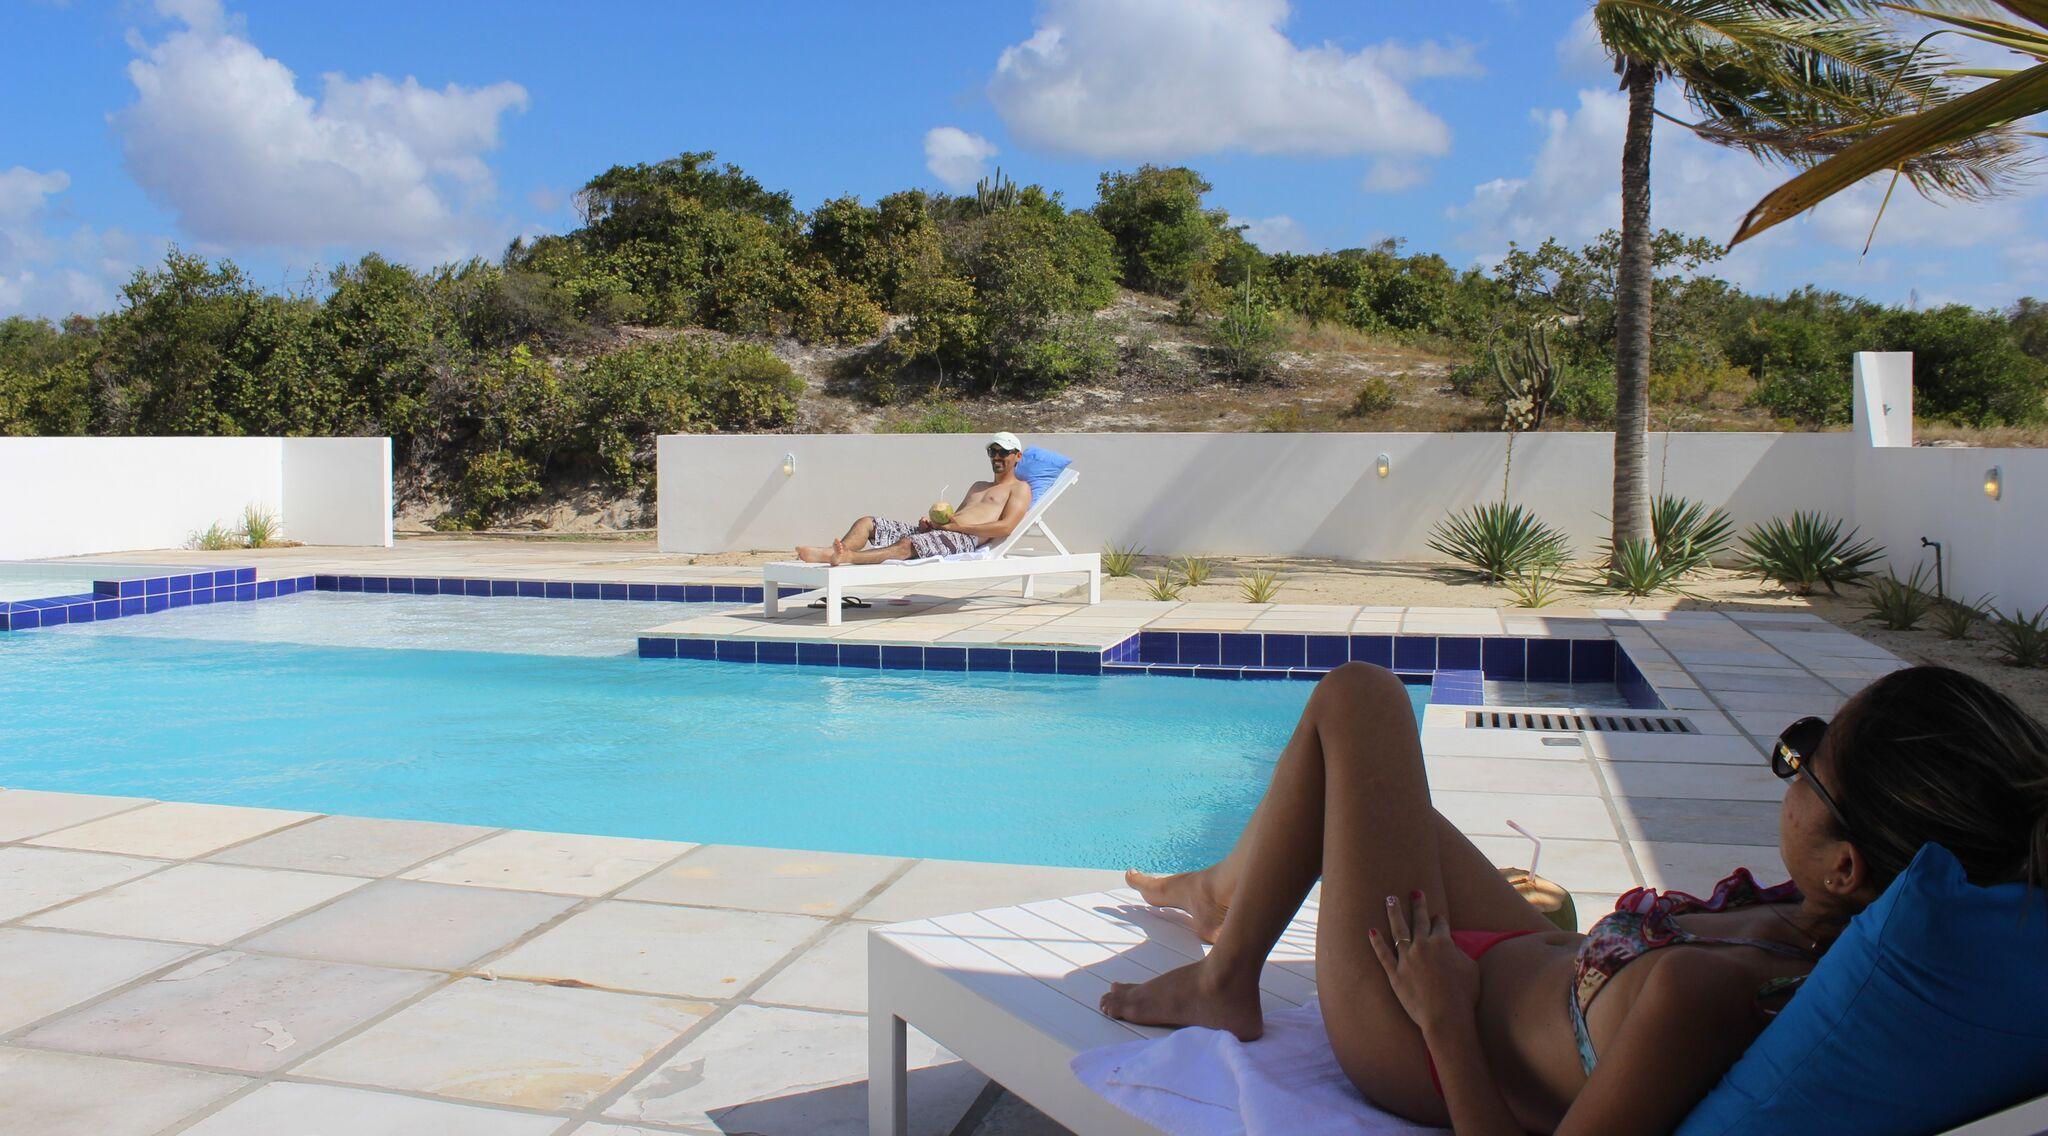 casa de praia com piscina RN Brasil